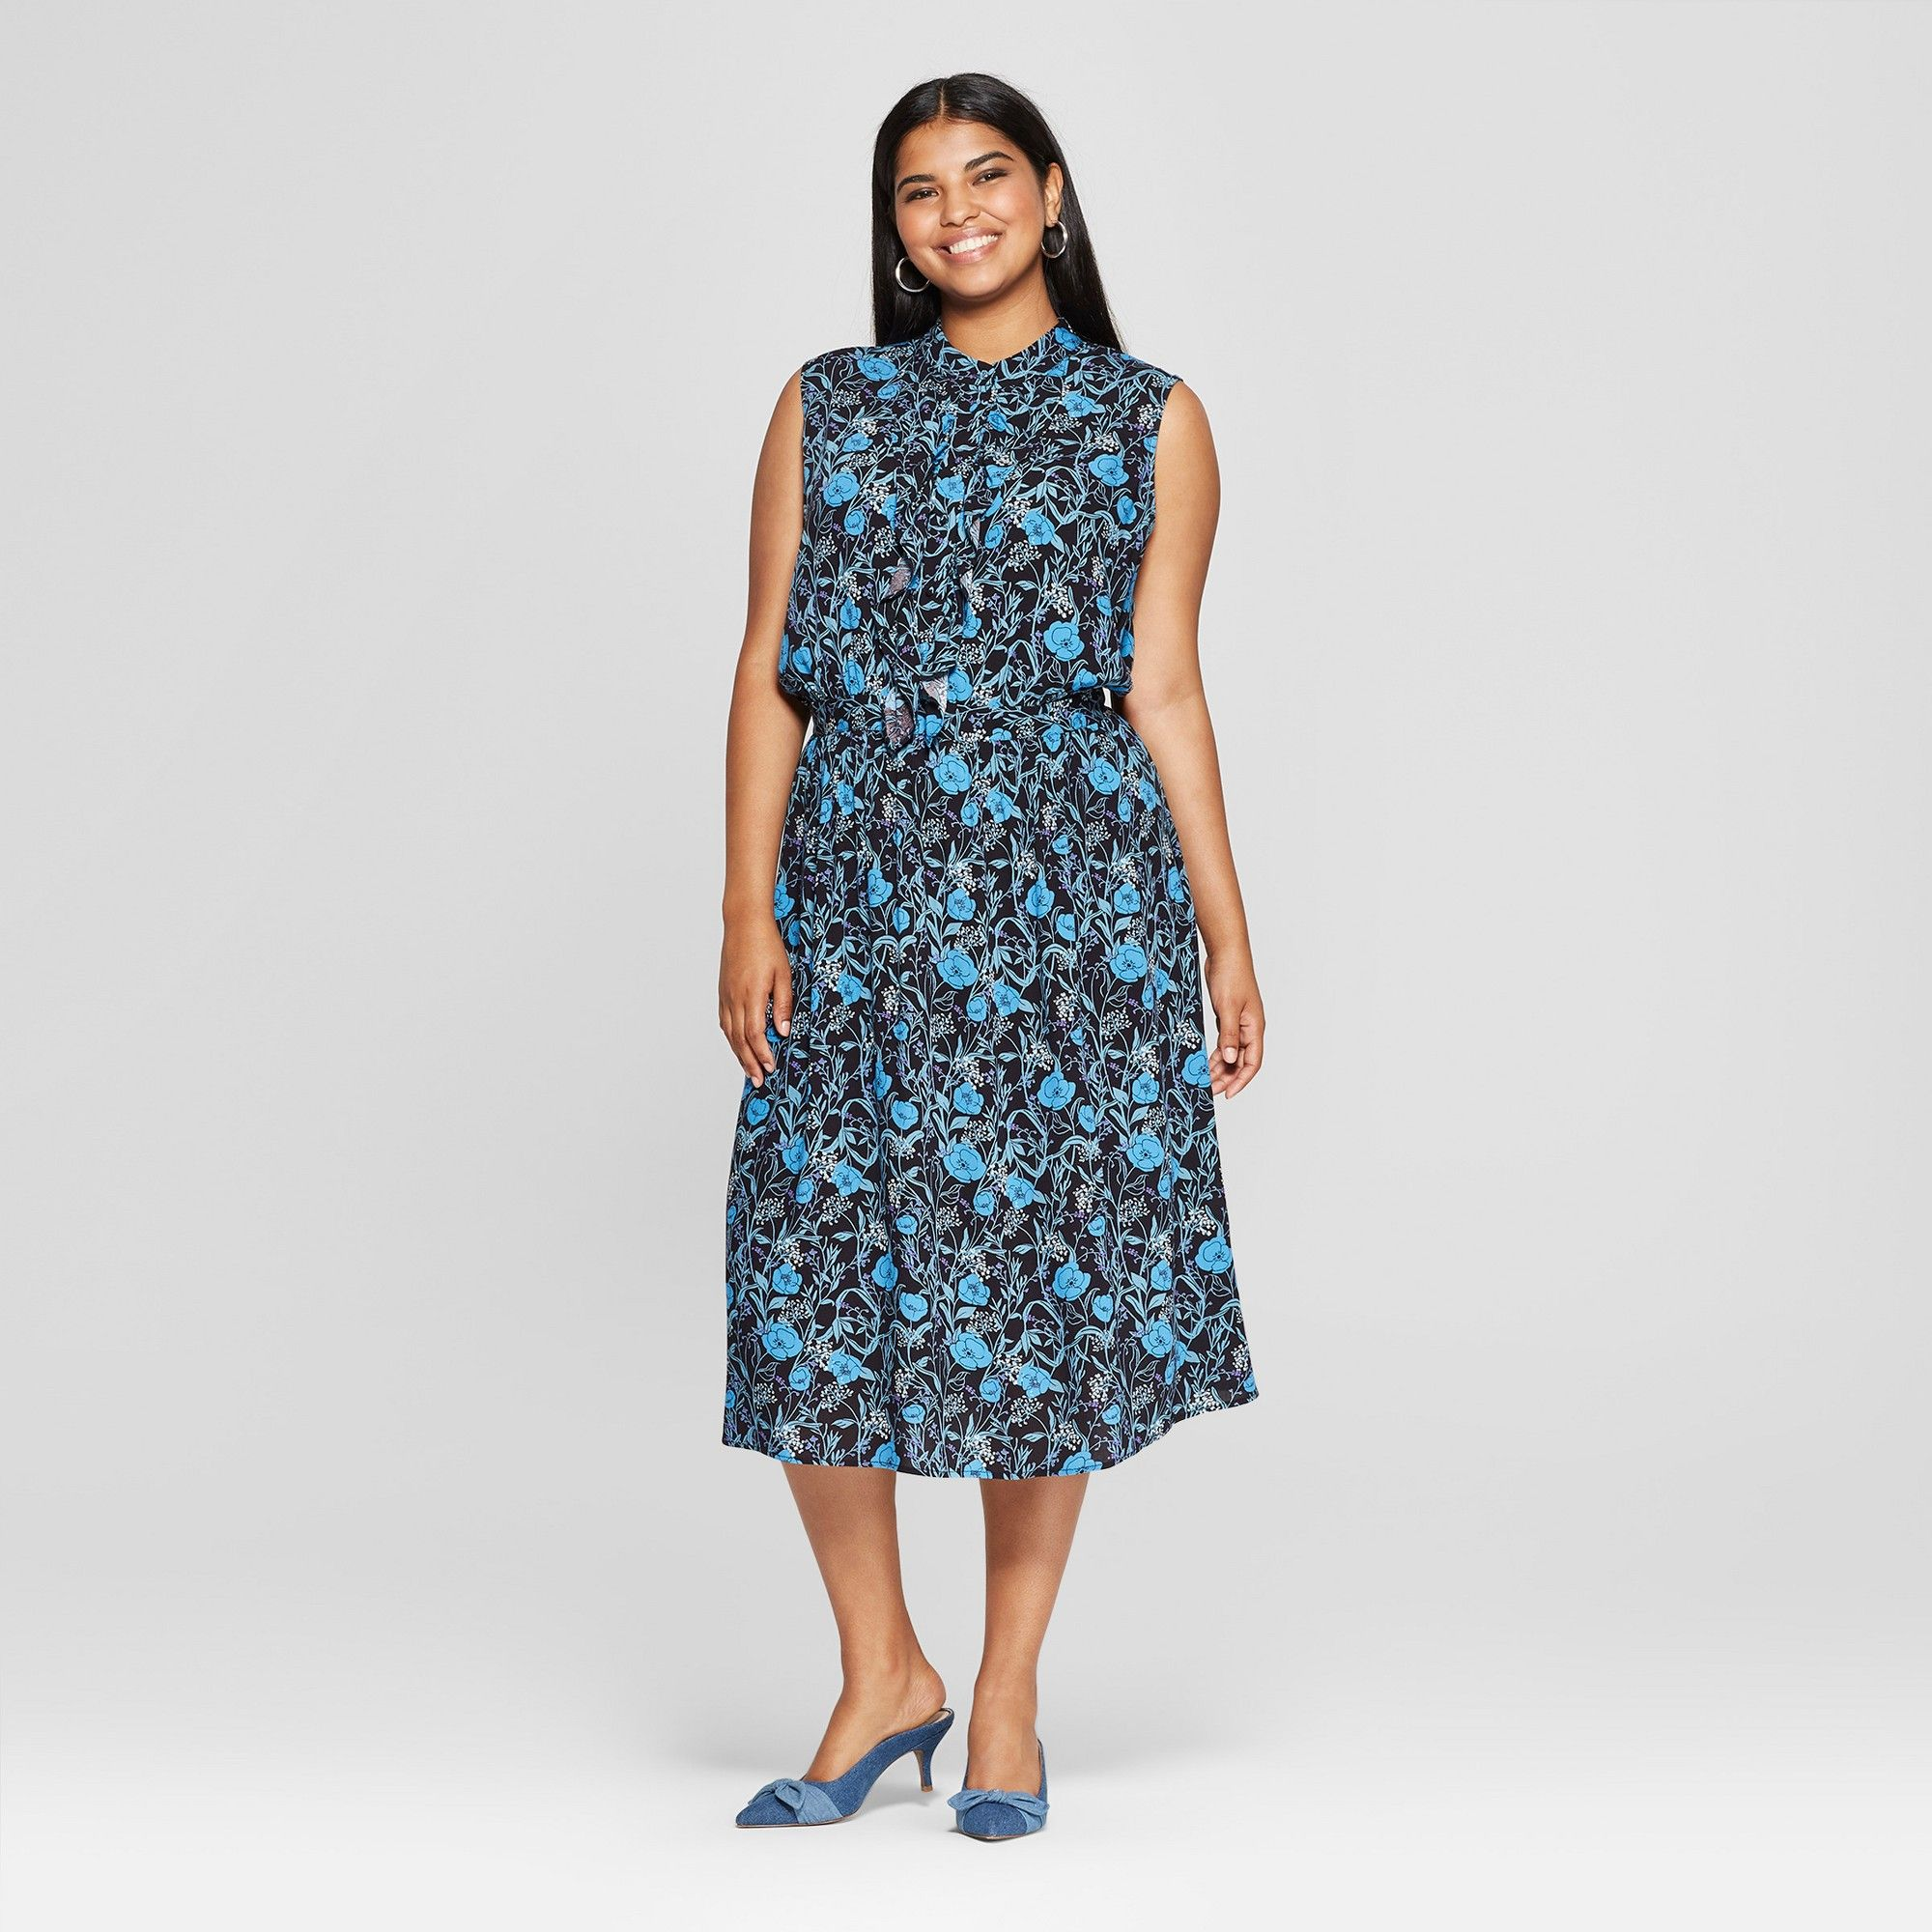 3d23405c3a2 Women s Plus Size Floral Print Ruffle Placket Midi Dress - Who What Wear  Black Blue 4X